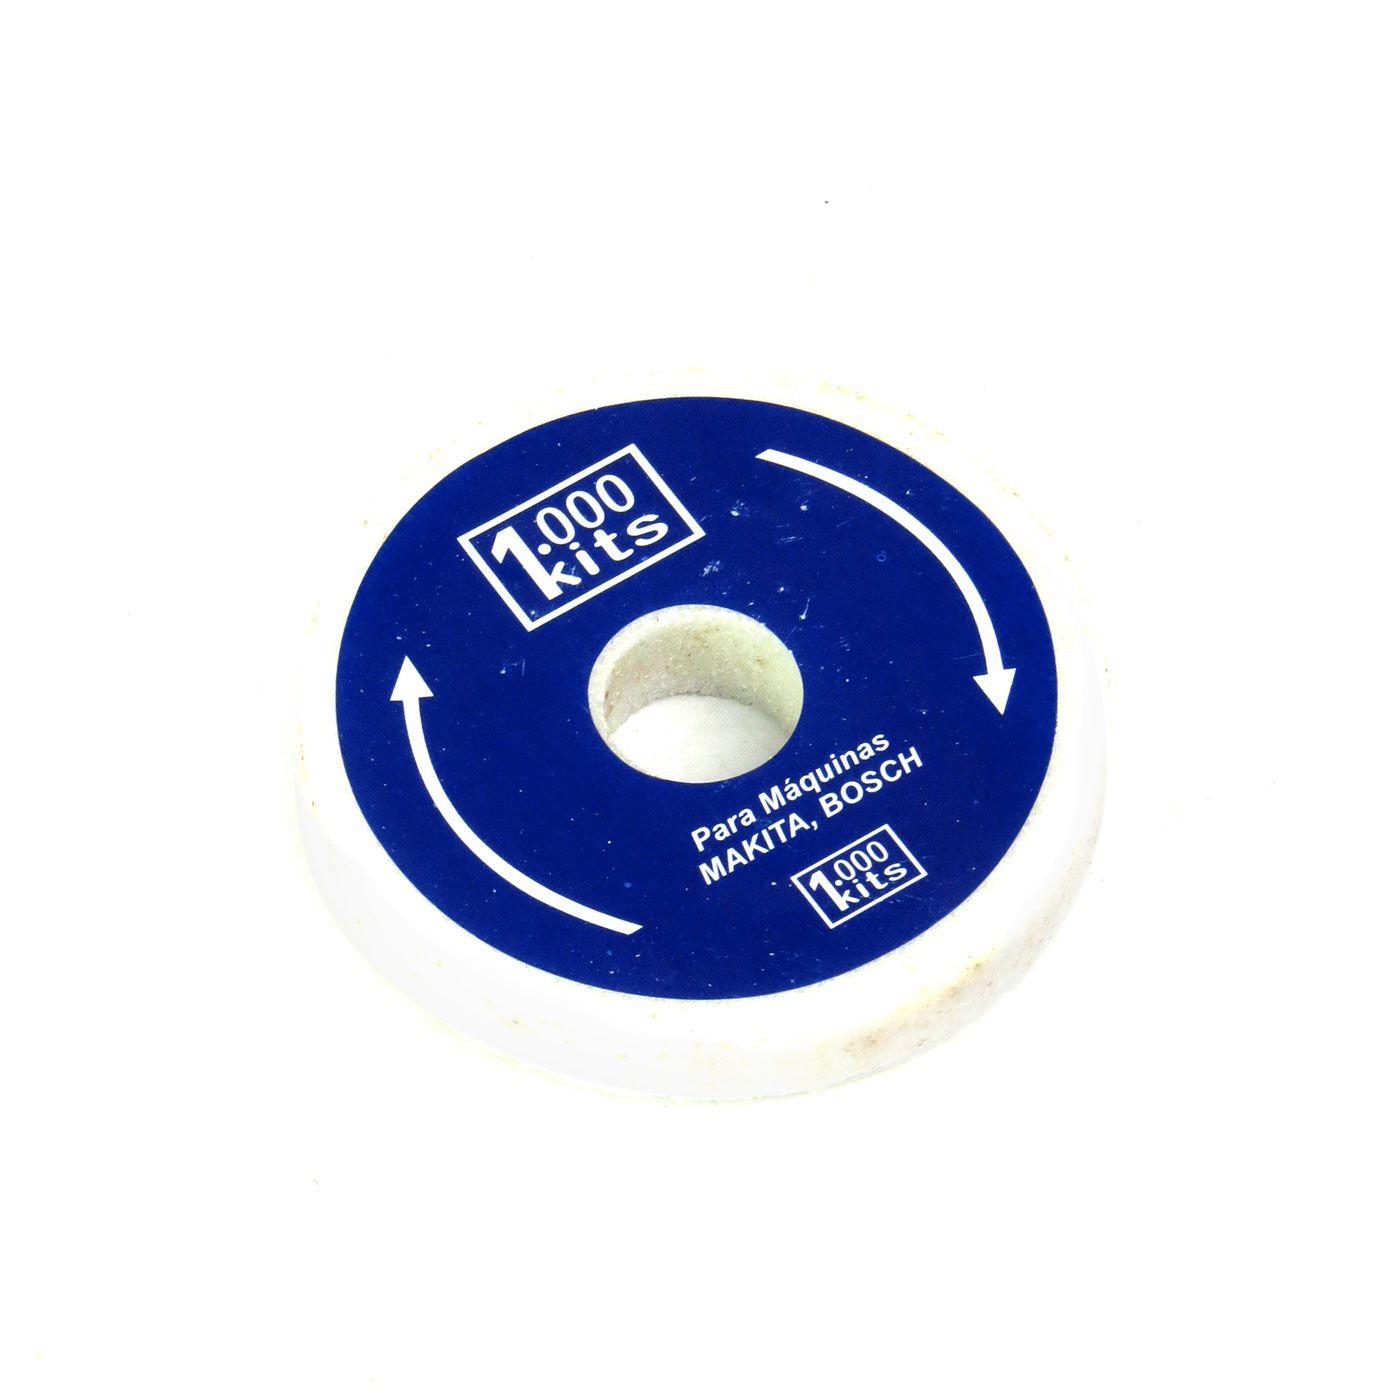 Kit Completo Afiador de Faca+Rebolo+Escova 1000 Kits M1 Cód.KITM-01